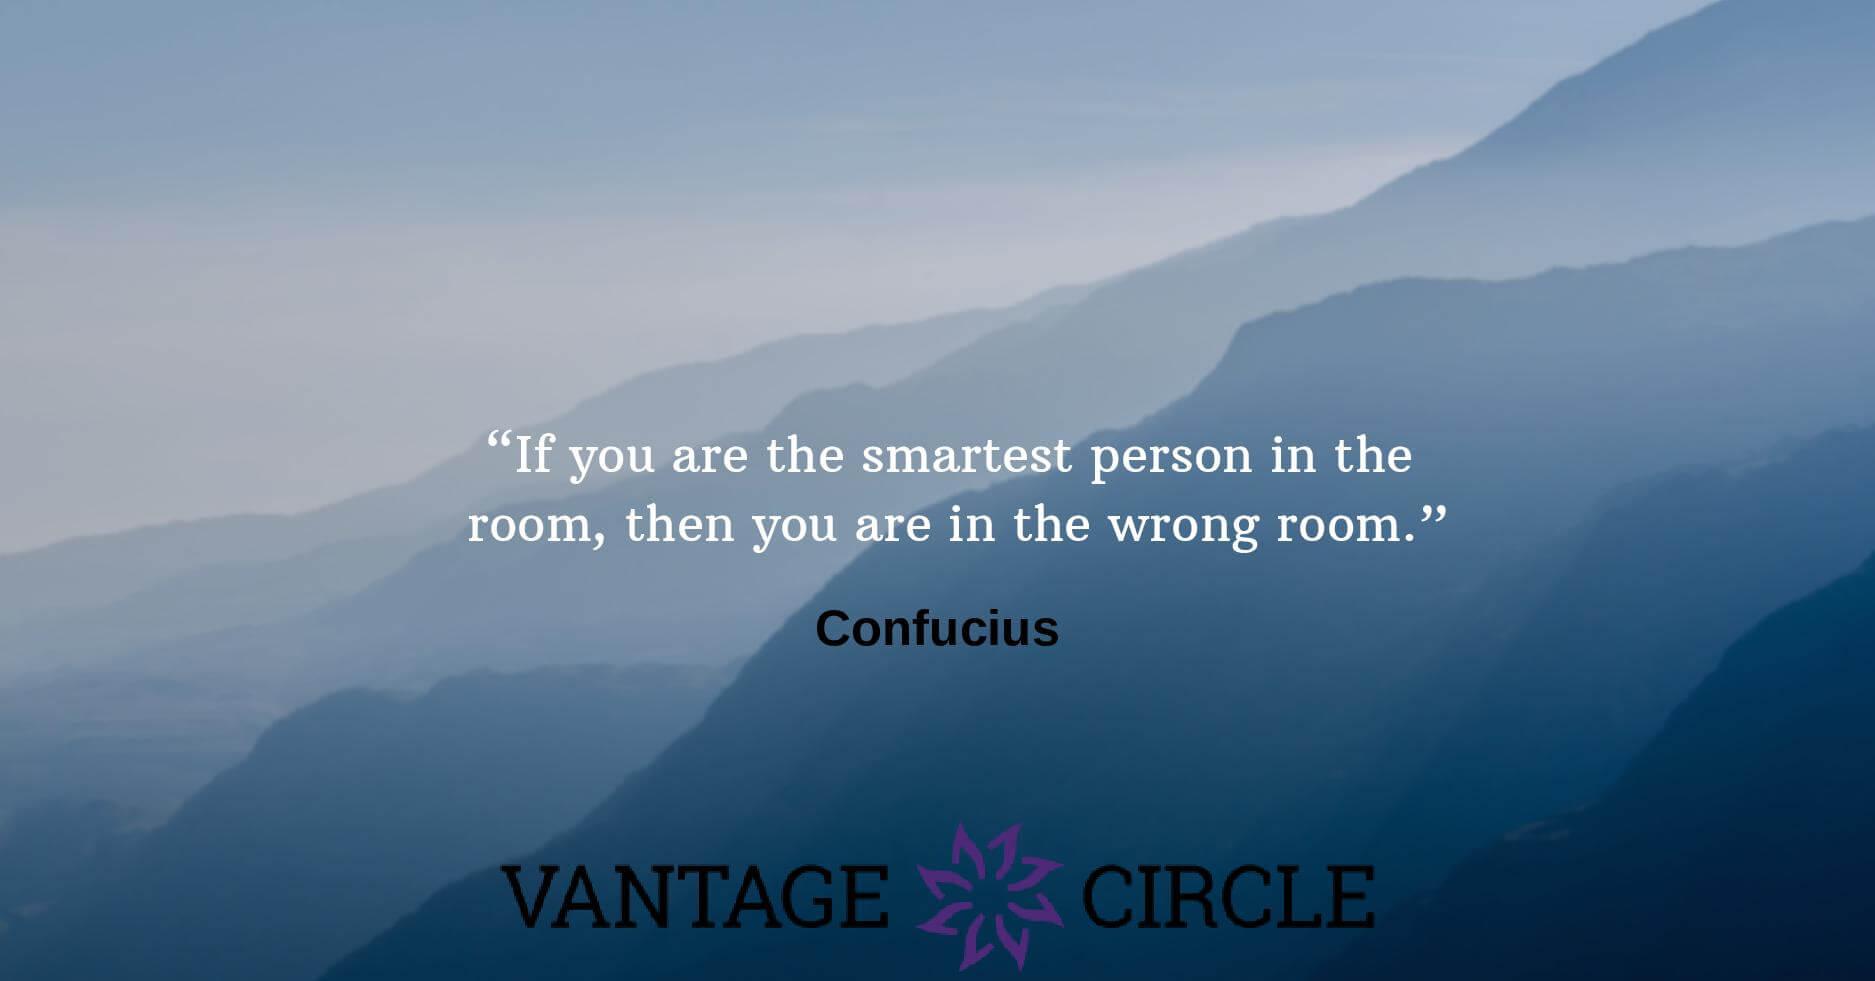 Employee-motivational-quotes-Confucius